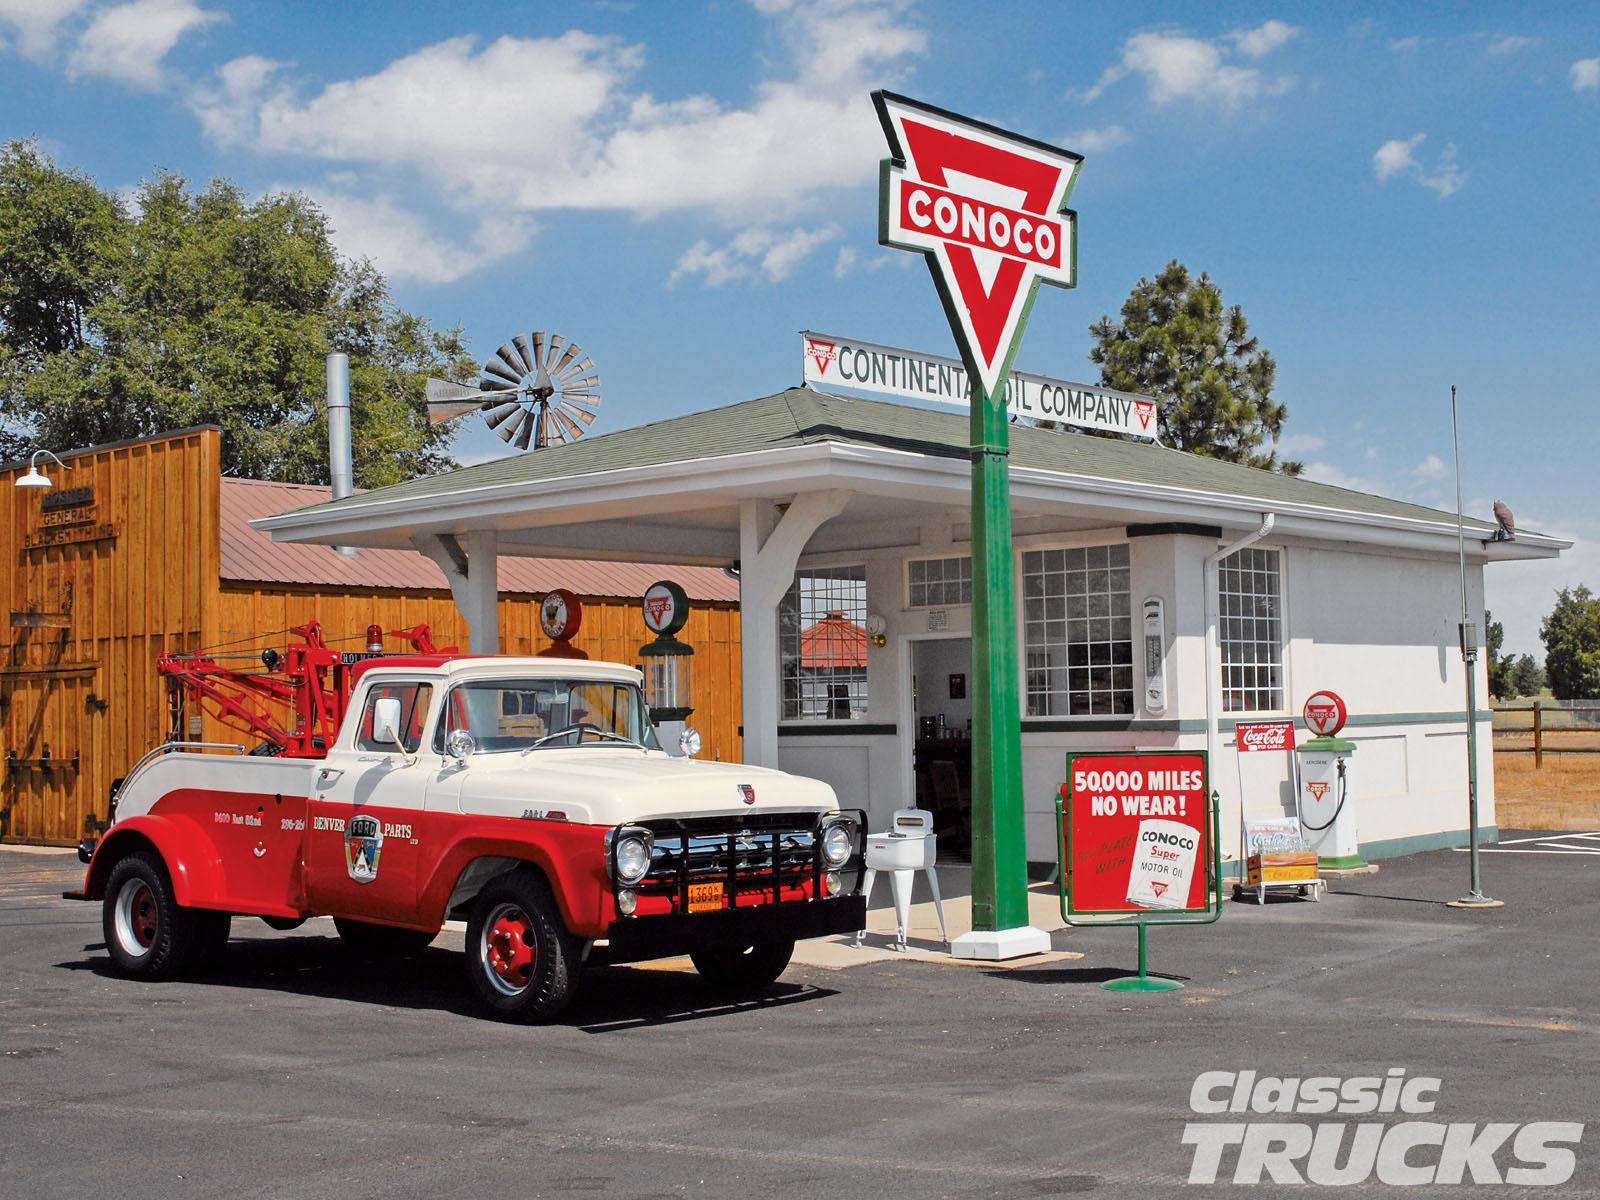 1957 Ford F 350 Pickup Truck   Hot Rod Network 1600x1200